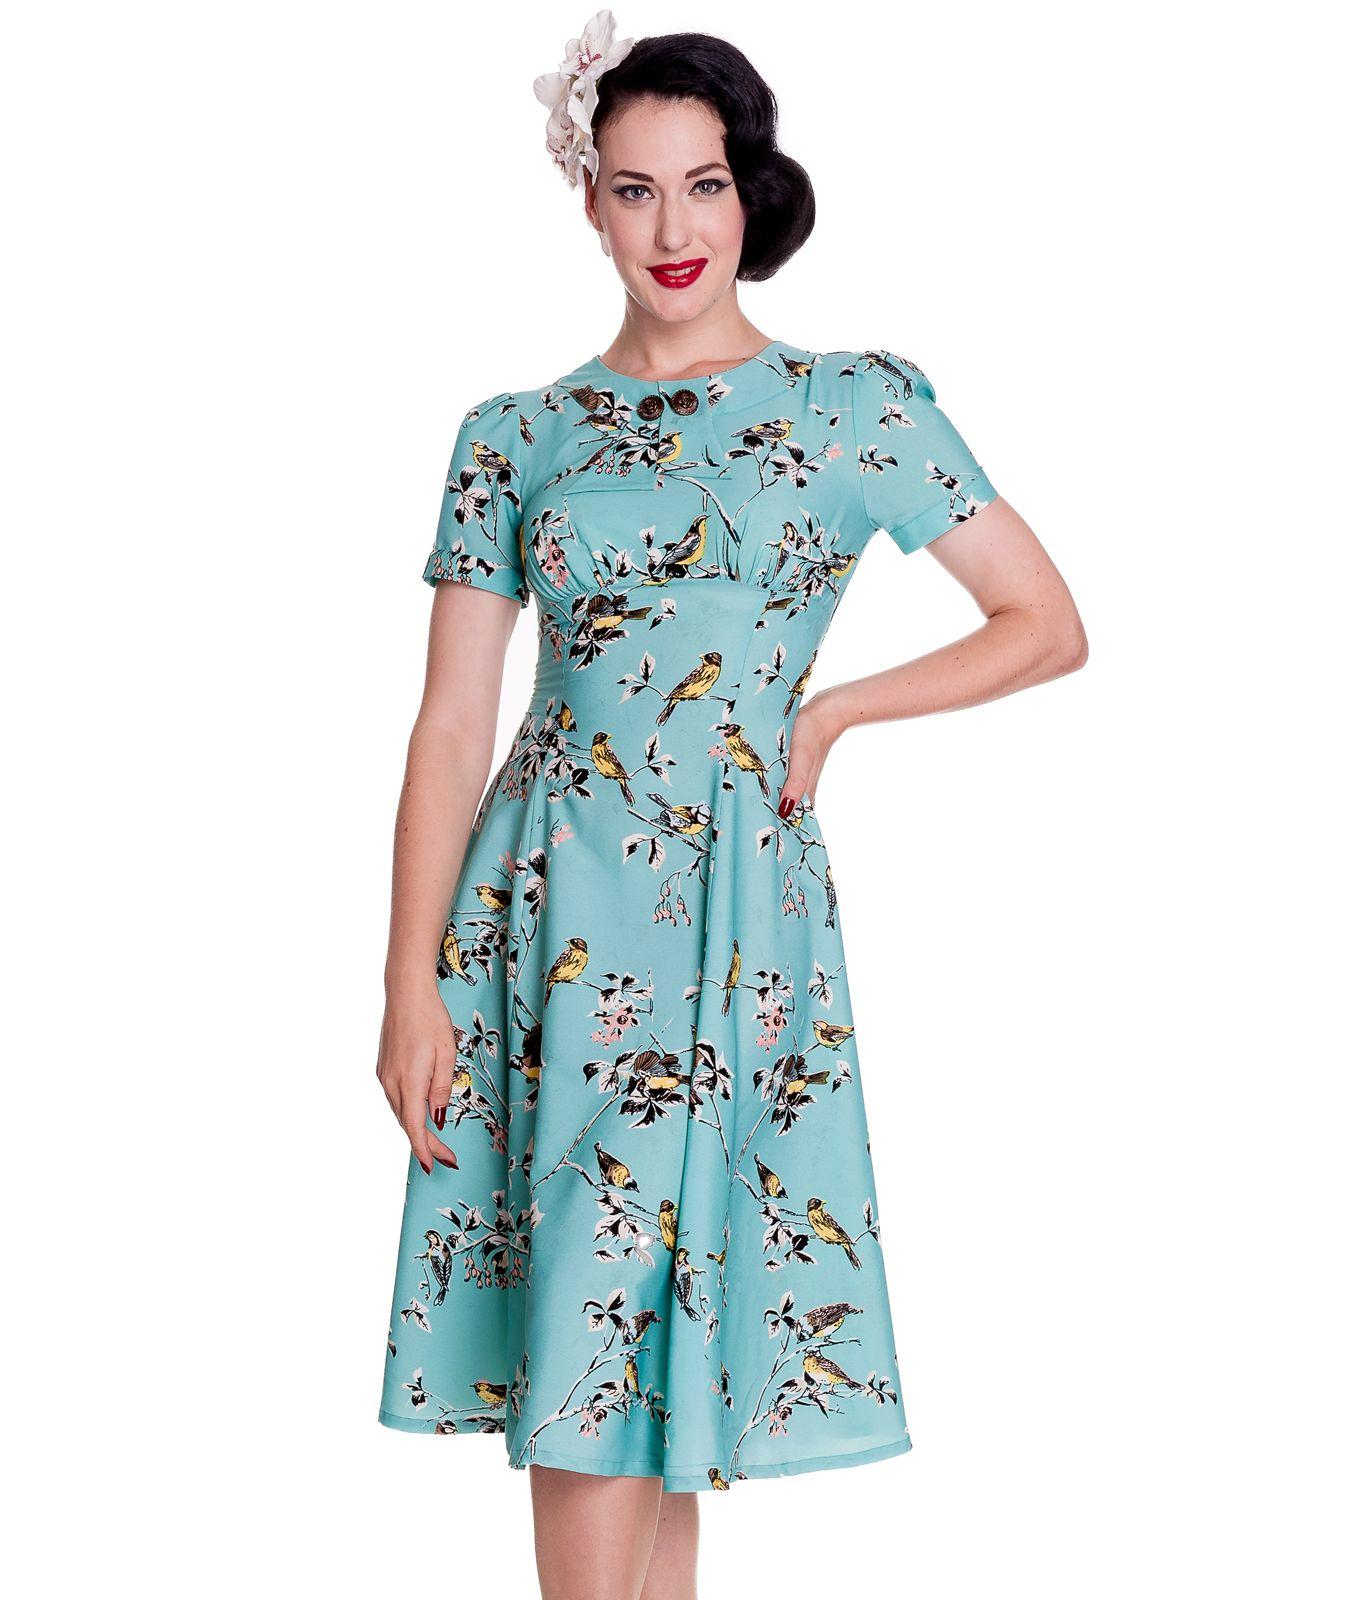 Beautiful ss style tea dress with pretty retro style print